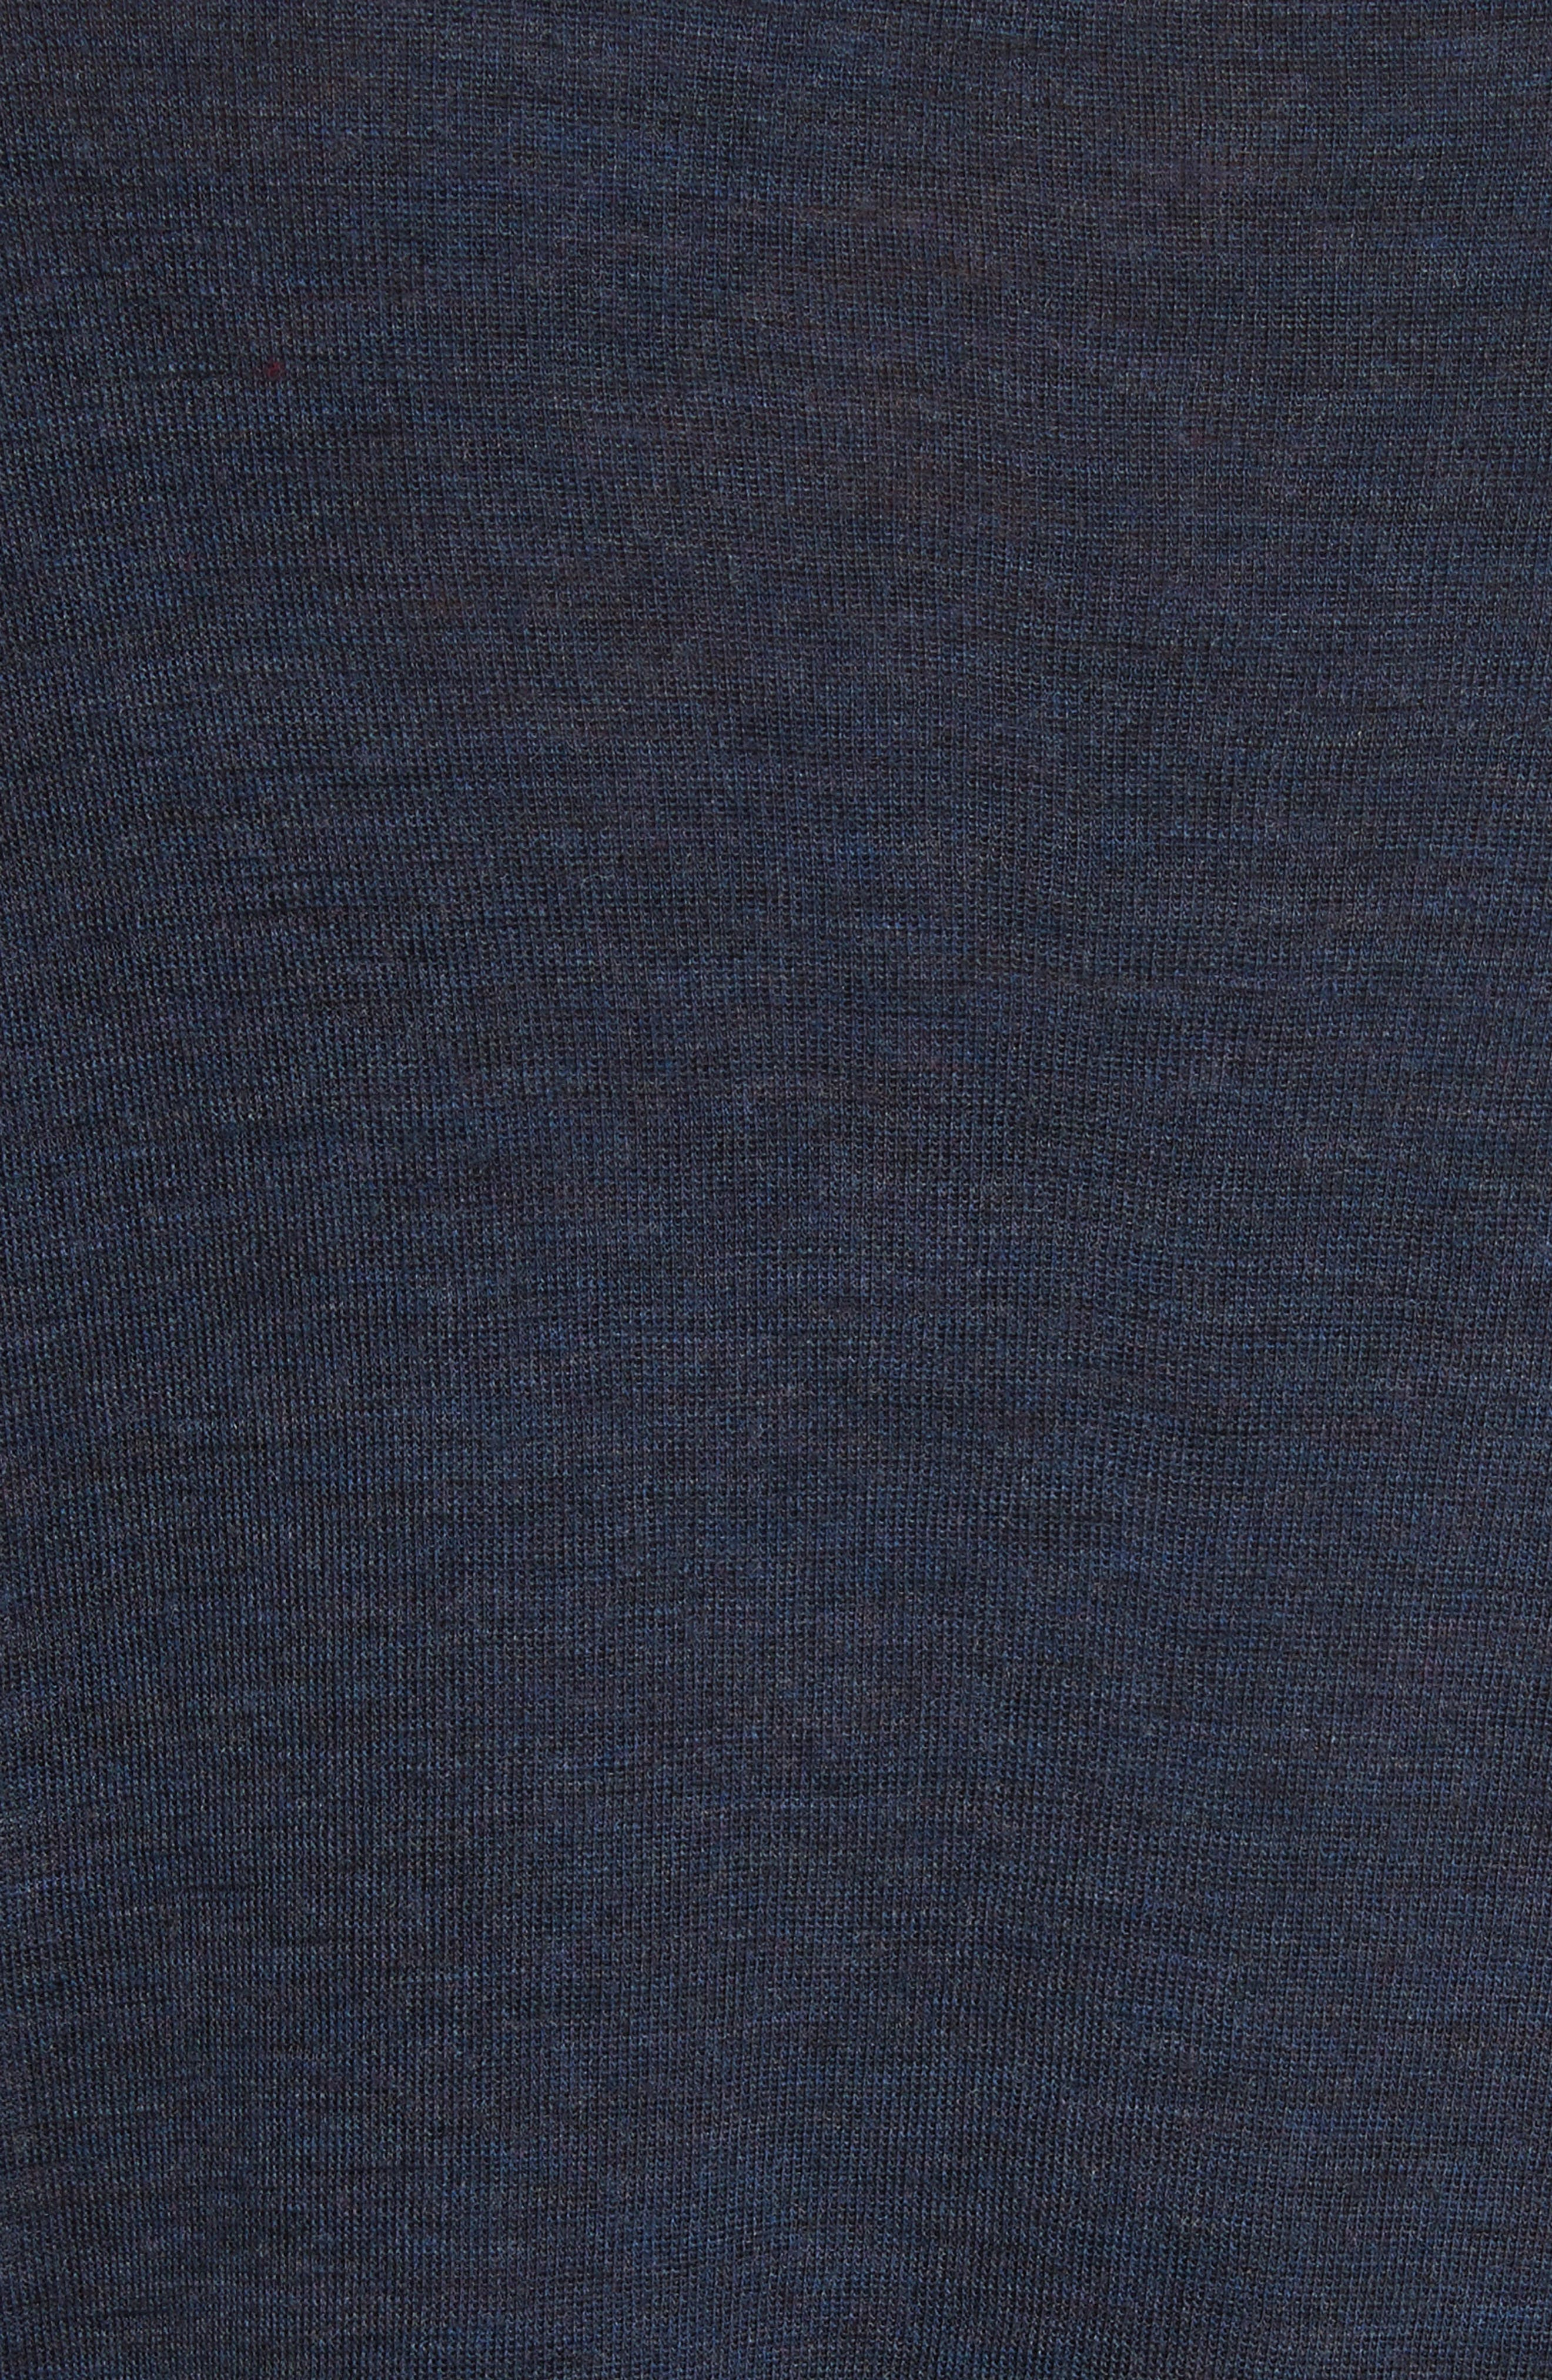 Wool Pullover,                             Alternate thumbnail 6, color,                             Coastal